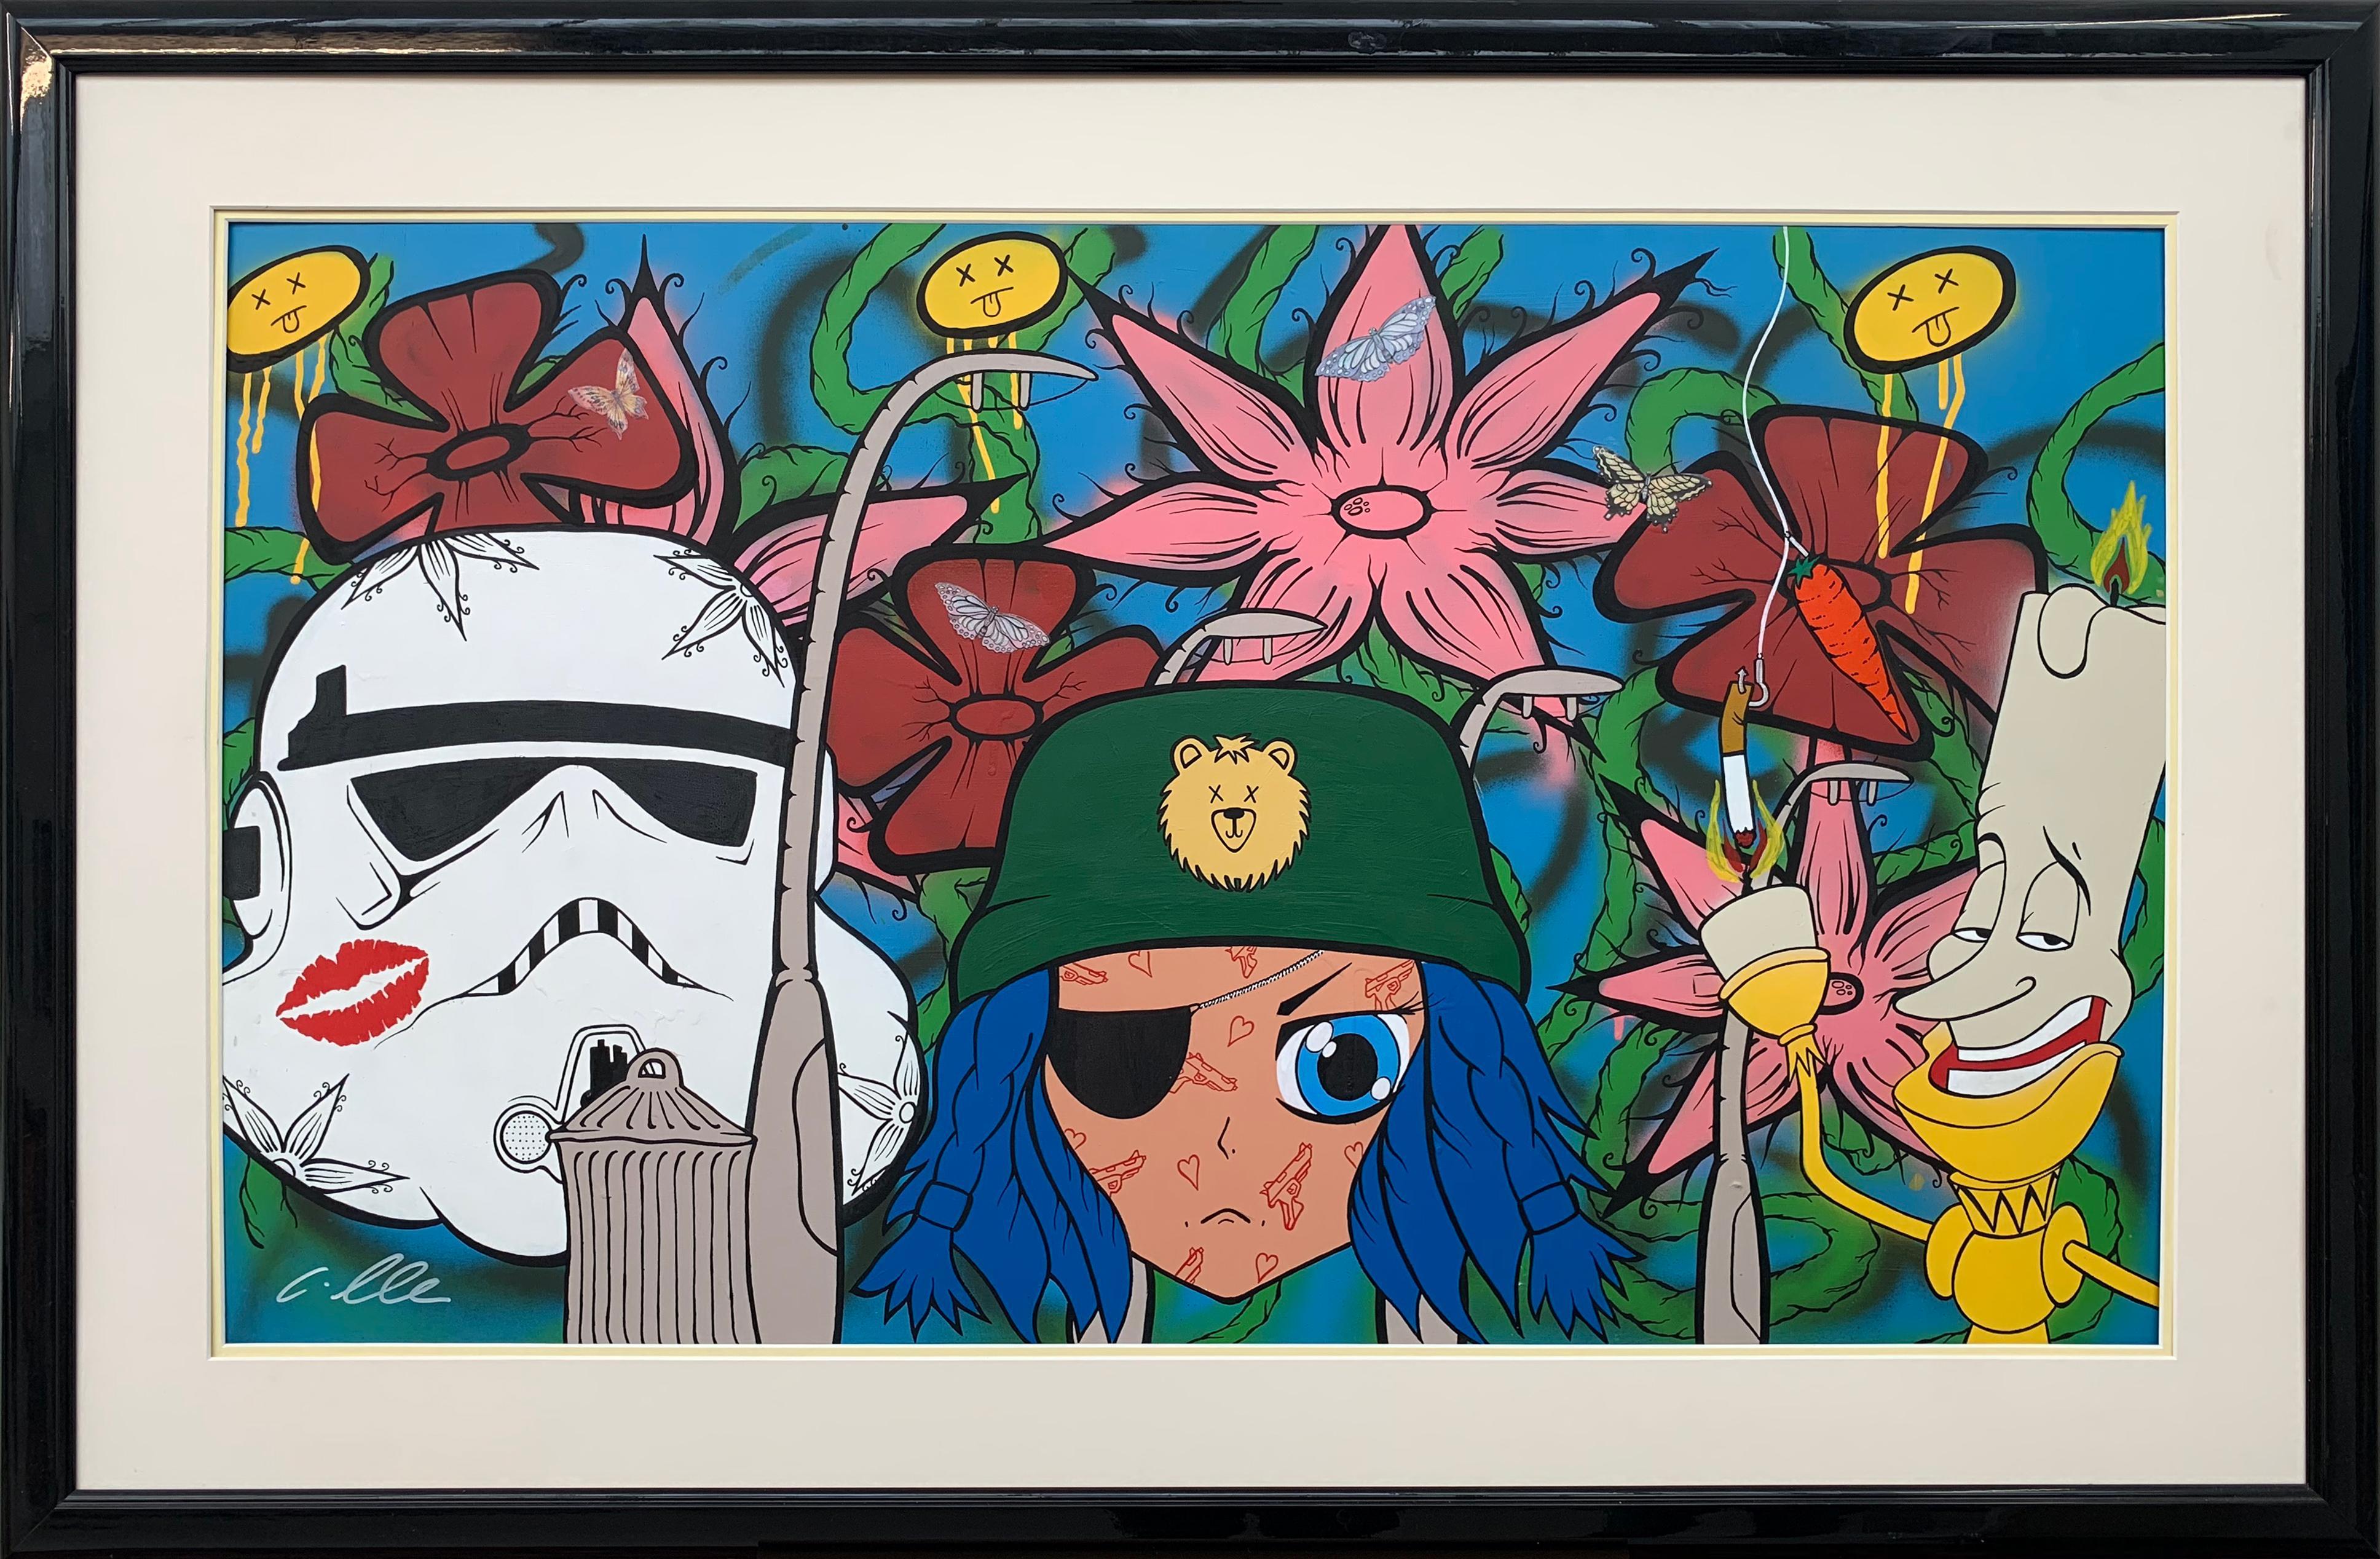 The Good The Bad & The Ugly Pop Art by British Urban Graffiti Artist